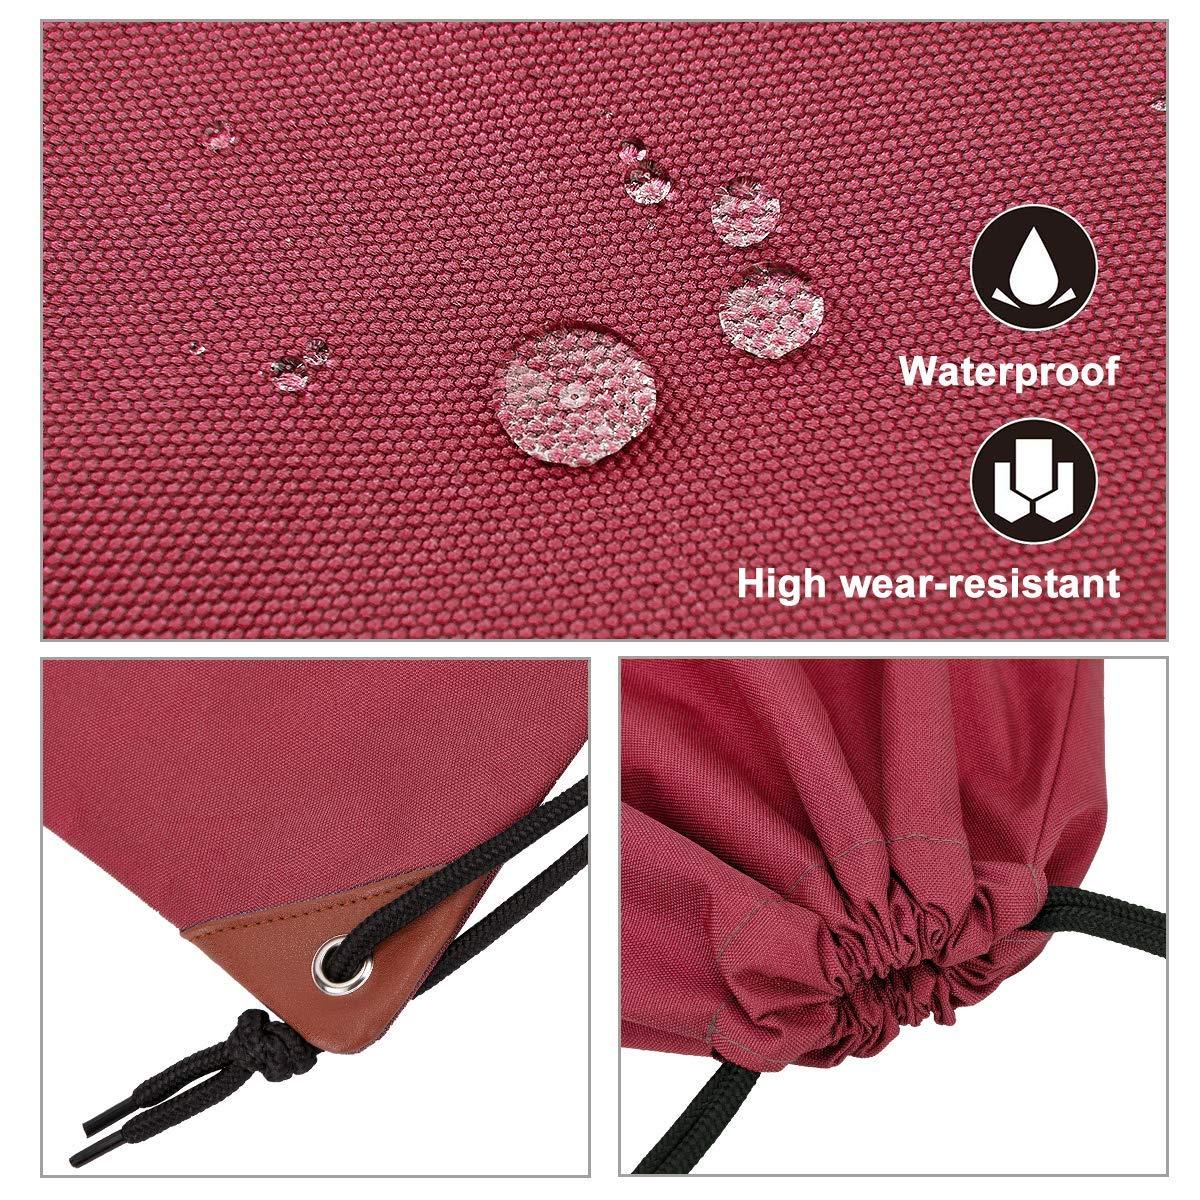 LIVACASA Mochila de Cuerdas Mujer Hombre Bolsas de Cuerdas Bolso Mujer Casual A Prueba de Agua Impermeable Bolsillo Exterior Extra Ajustable Correas de Hombros